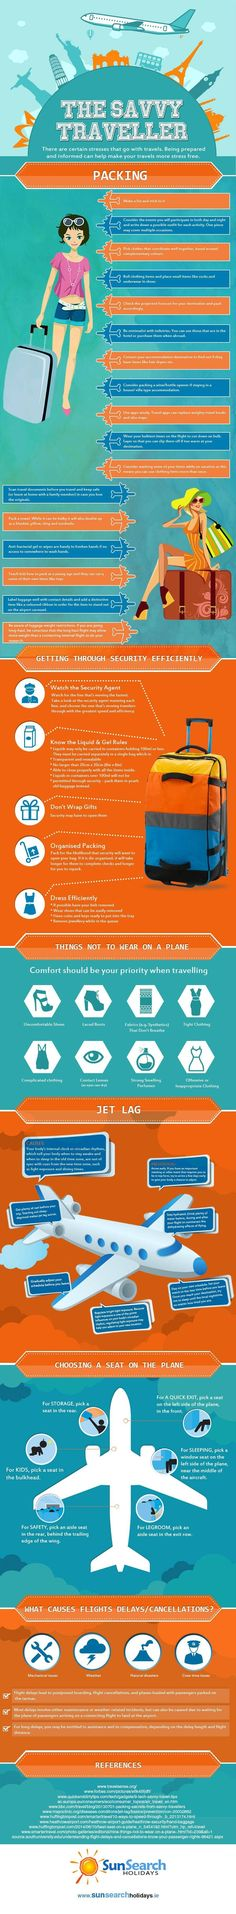 The Savvy Traveller #infographic #Travel #Infografía